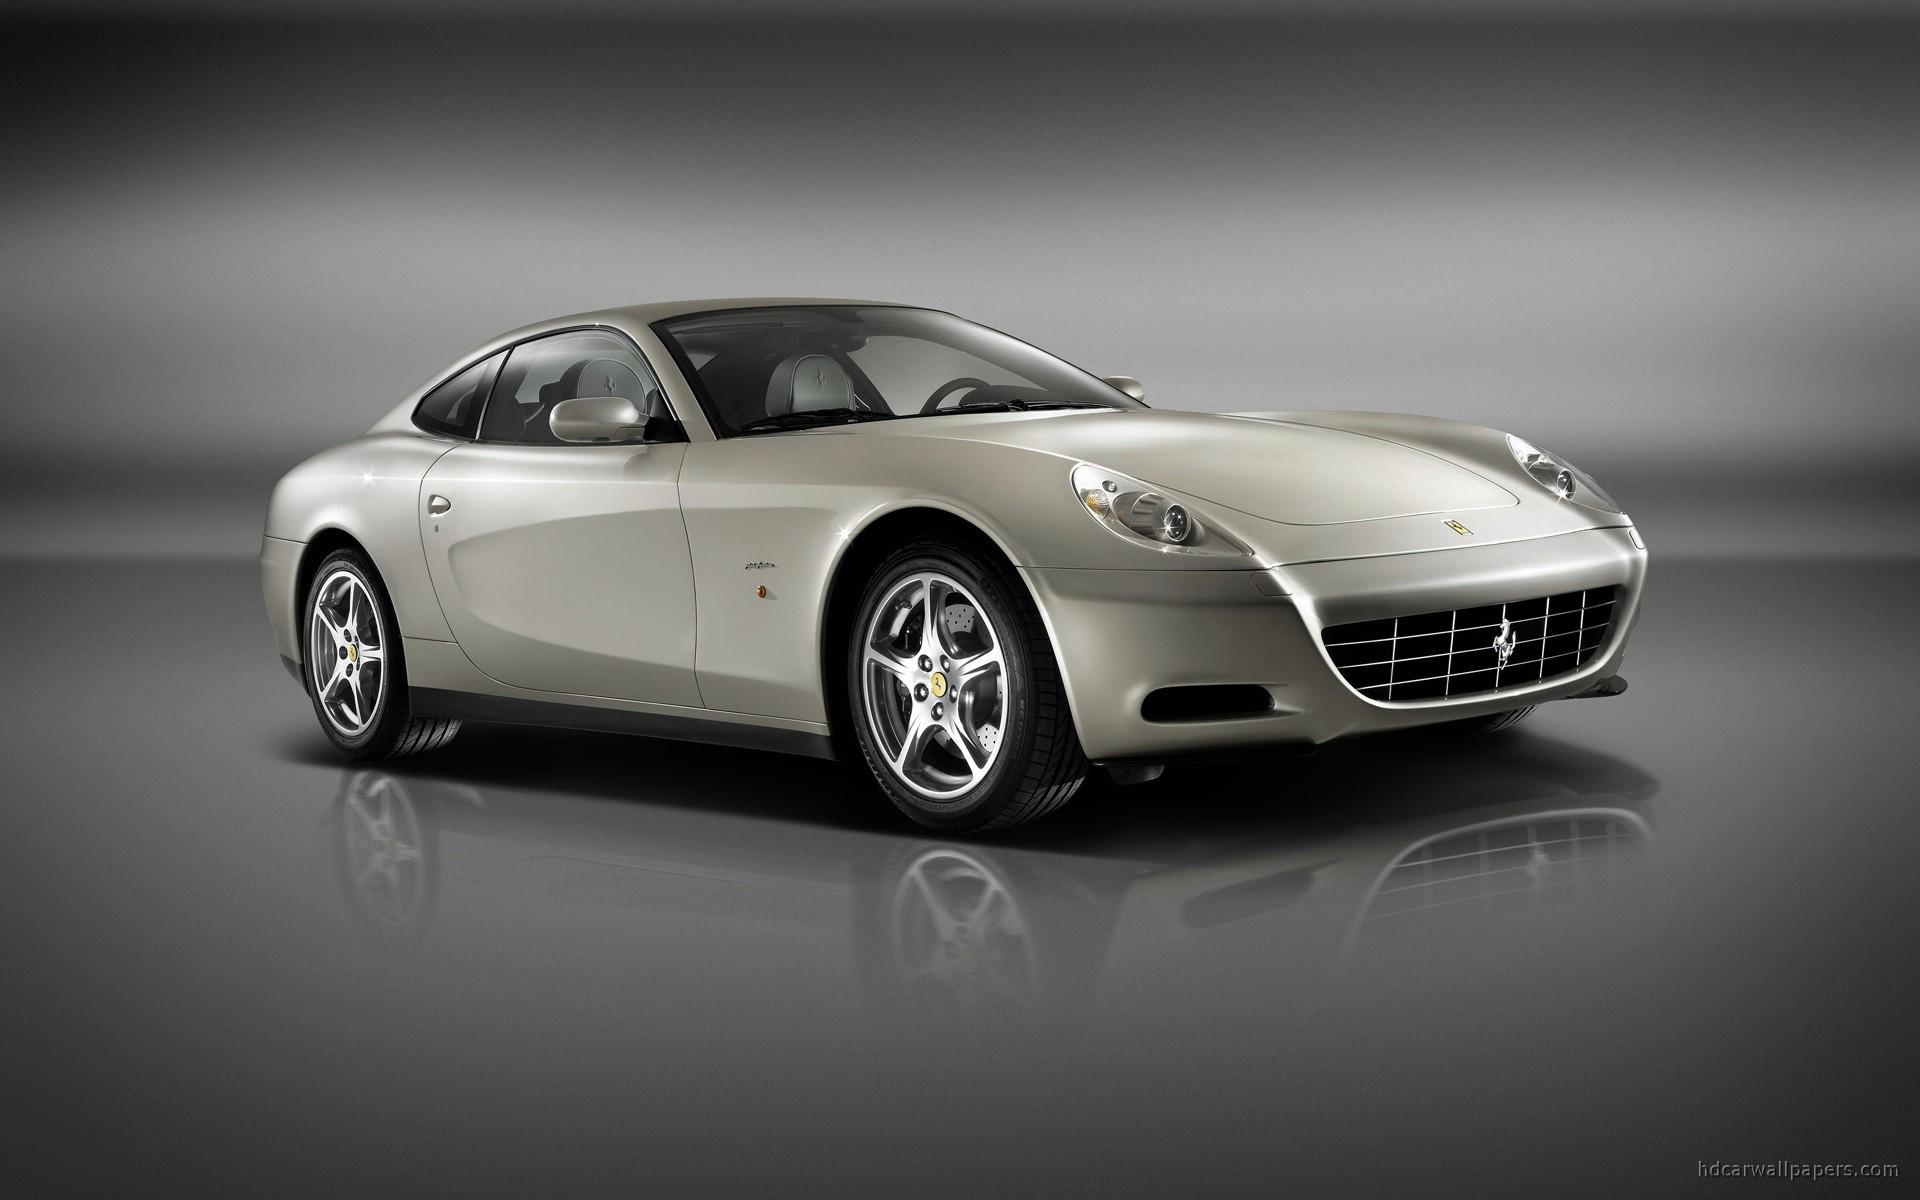 ferrari 612 scaglietti 5 wallpaper hd car wallpapers. Cars Review. Best American Auto & Cars Review